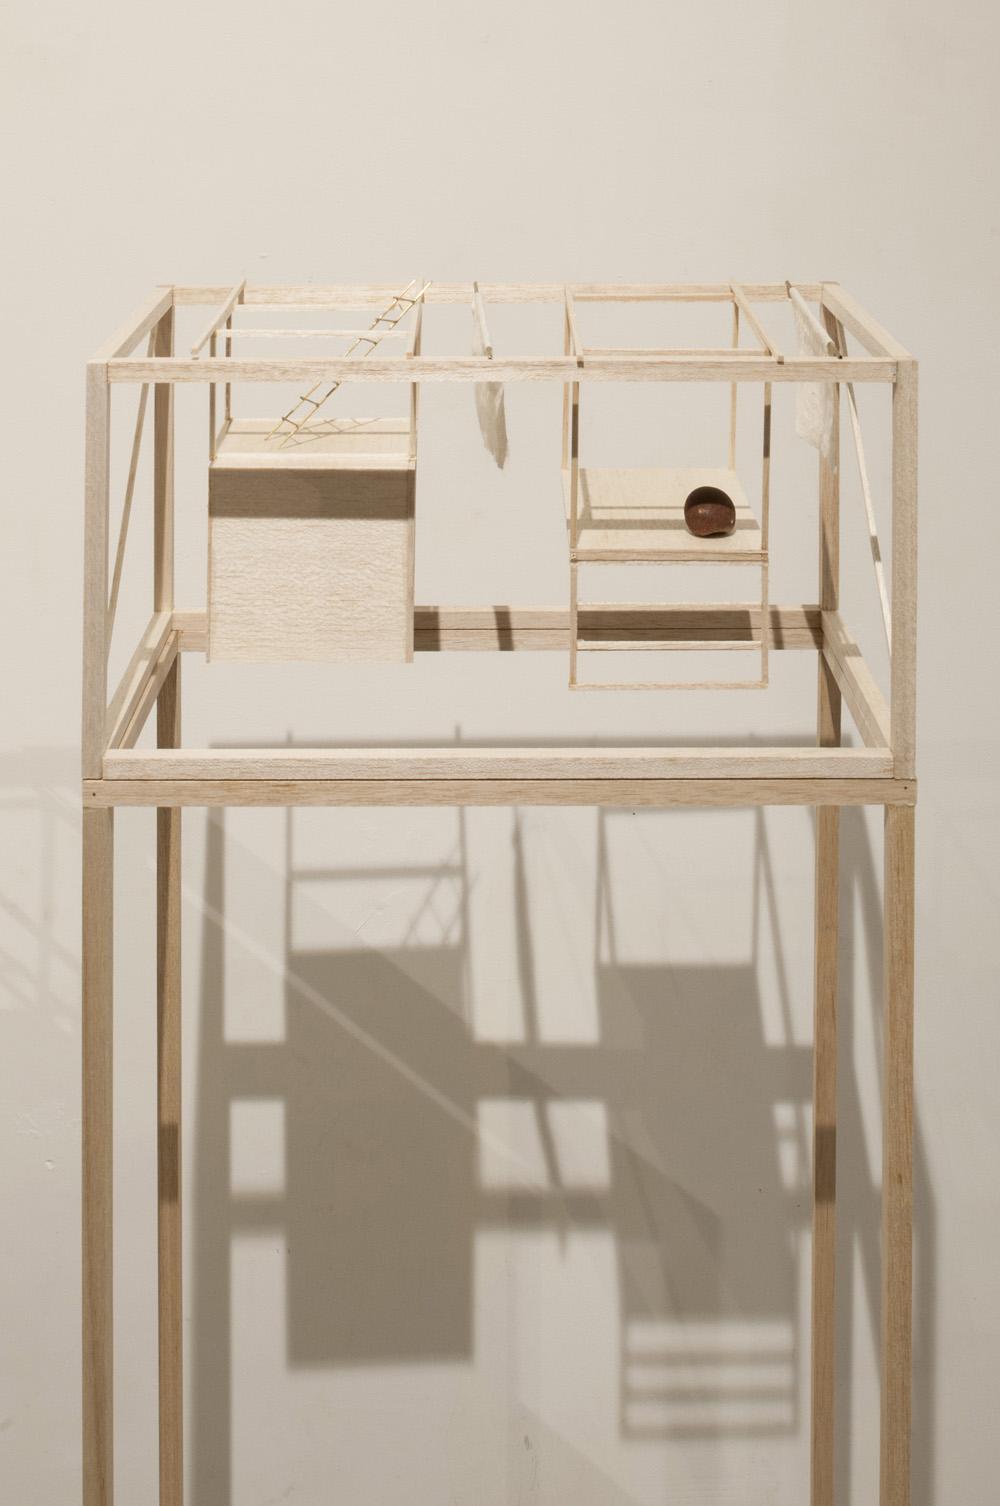 Maison 06, 2016, balsa, brass, stone, wire, cotton house 20 x 20 x 40 cm, pedestal 20 x 40 x 120 cm